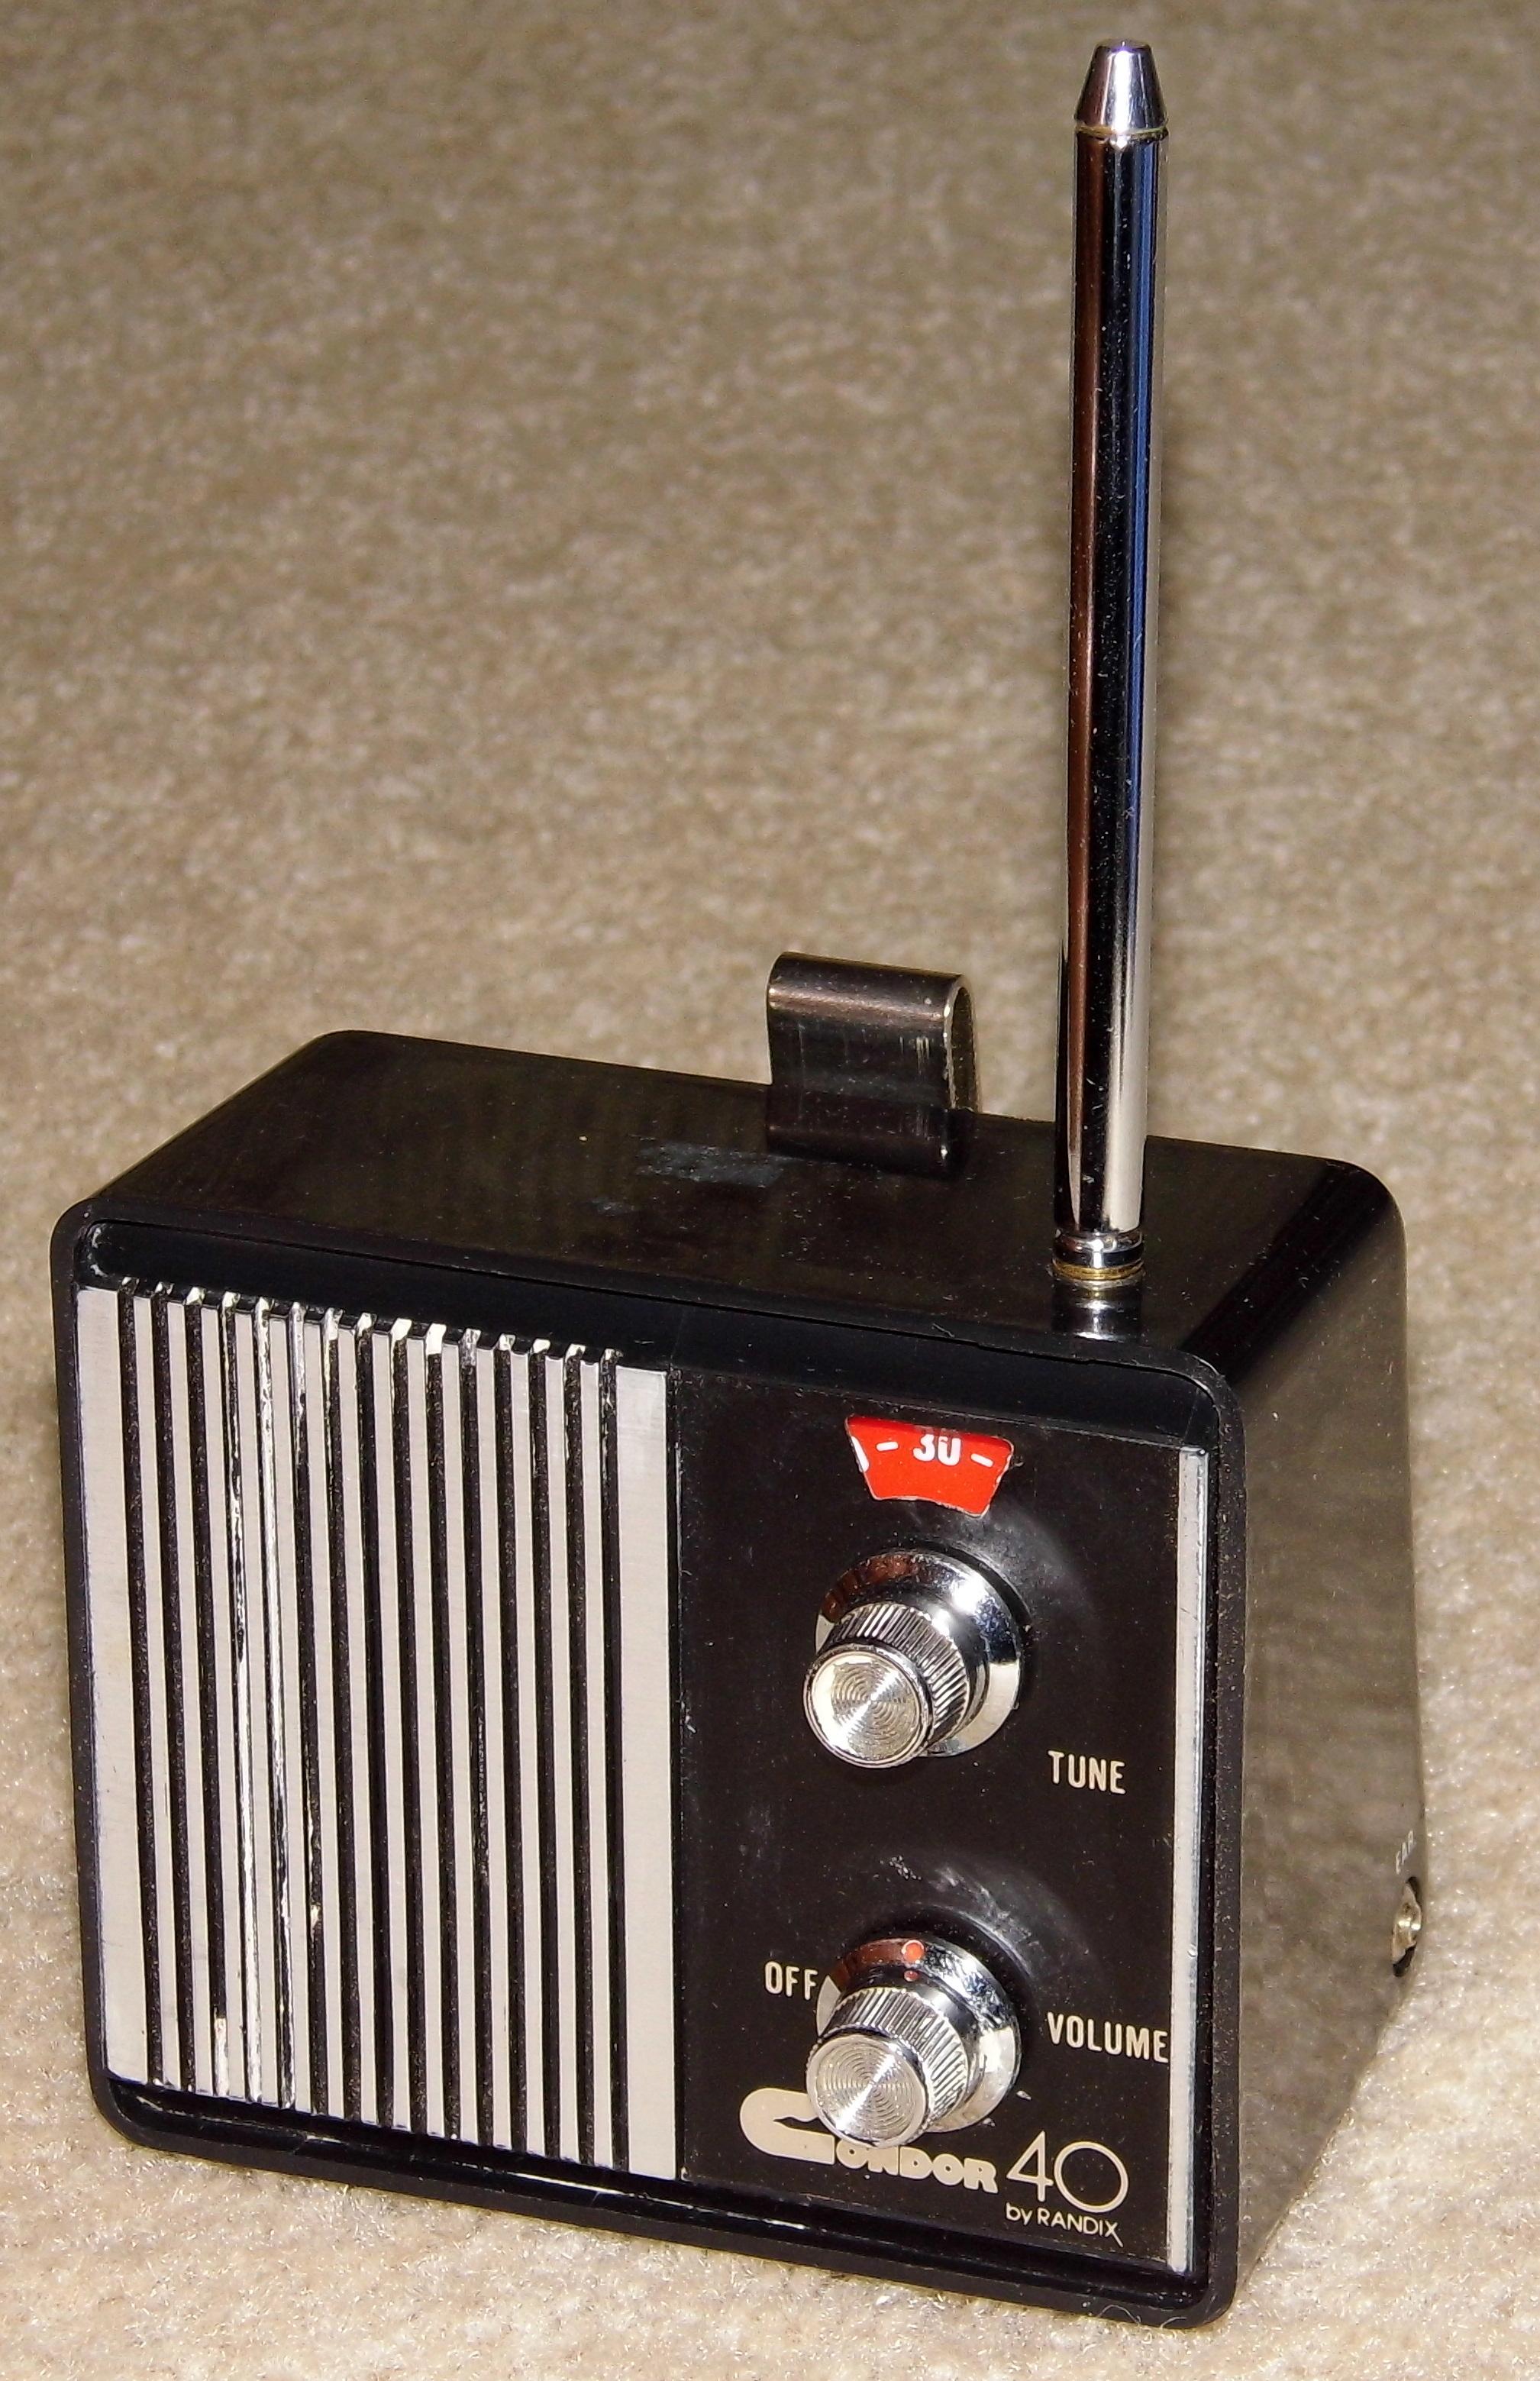 Modernistyczne File:Vintage Condor 40 CB Auto Receiver By Randix, Model TCB-56 CE05